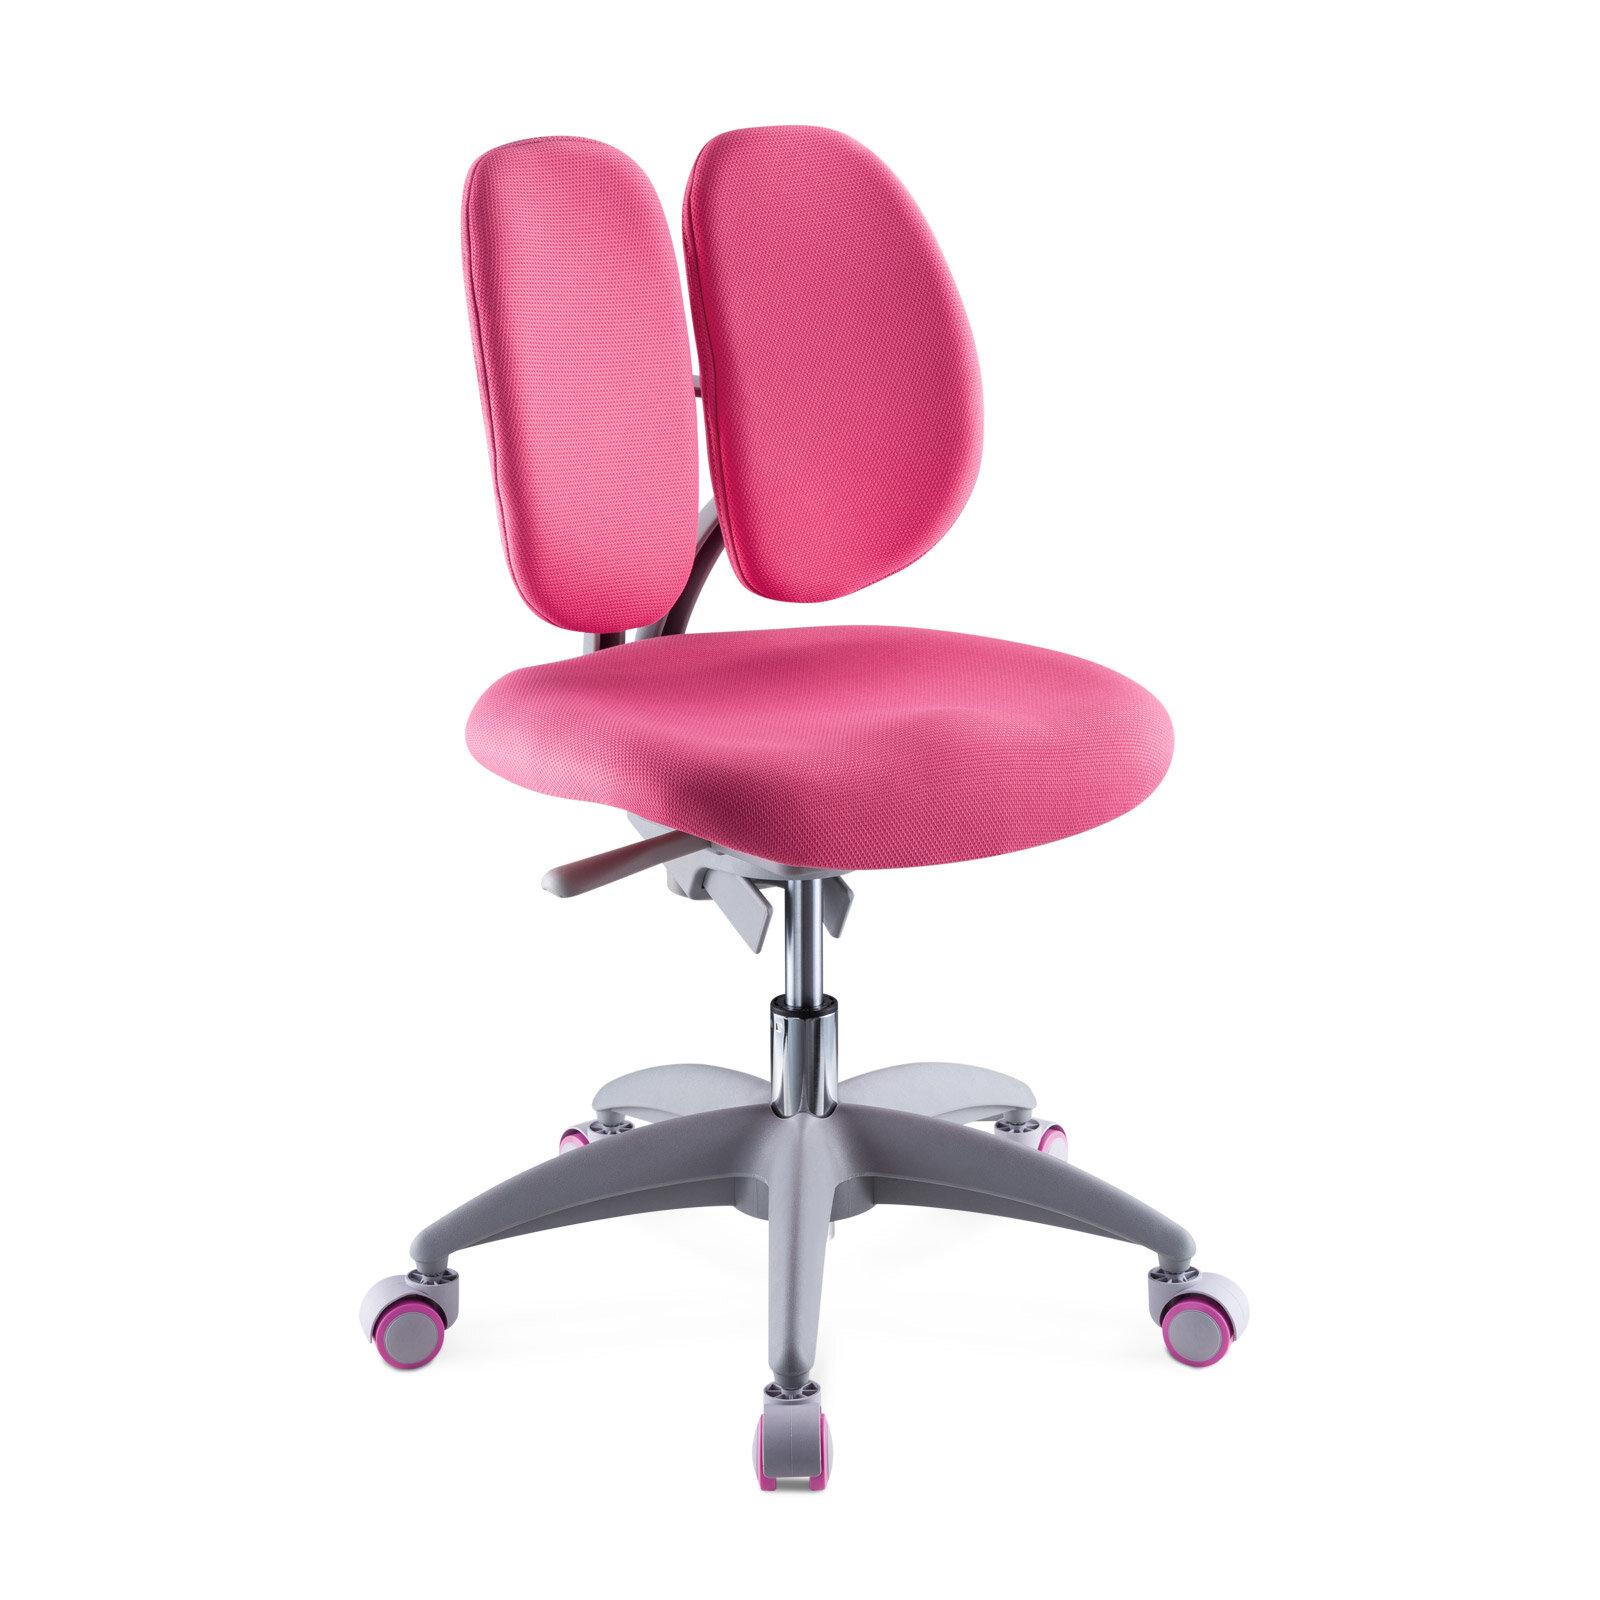 Tremendous Sweatt Ergonomic Kids Desk Chair Creativecarmelina Interior Chair Design Creativecarmelinacom